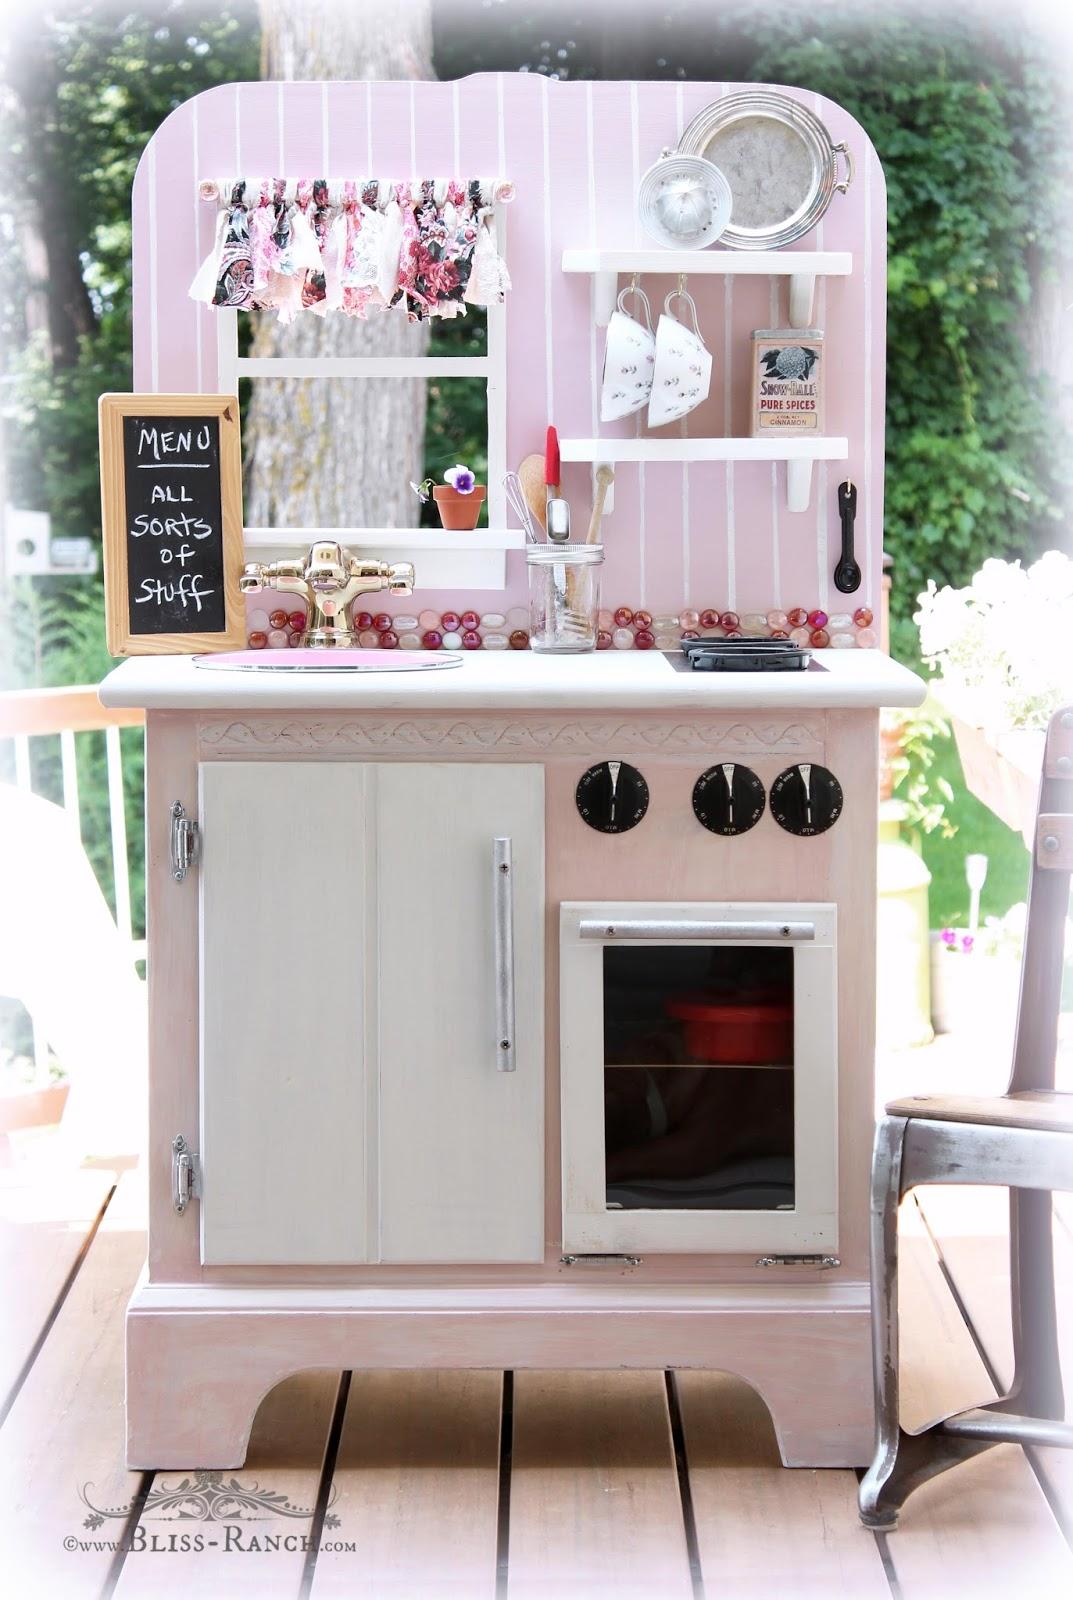 Recycled Nightstand Play Kitchen Bliss-Ranch.com  #playkitchen #maisonblanchepaint  #paintedfurniture #ad